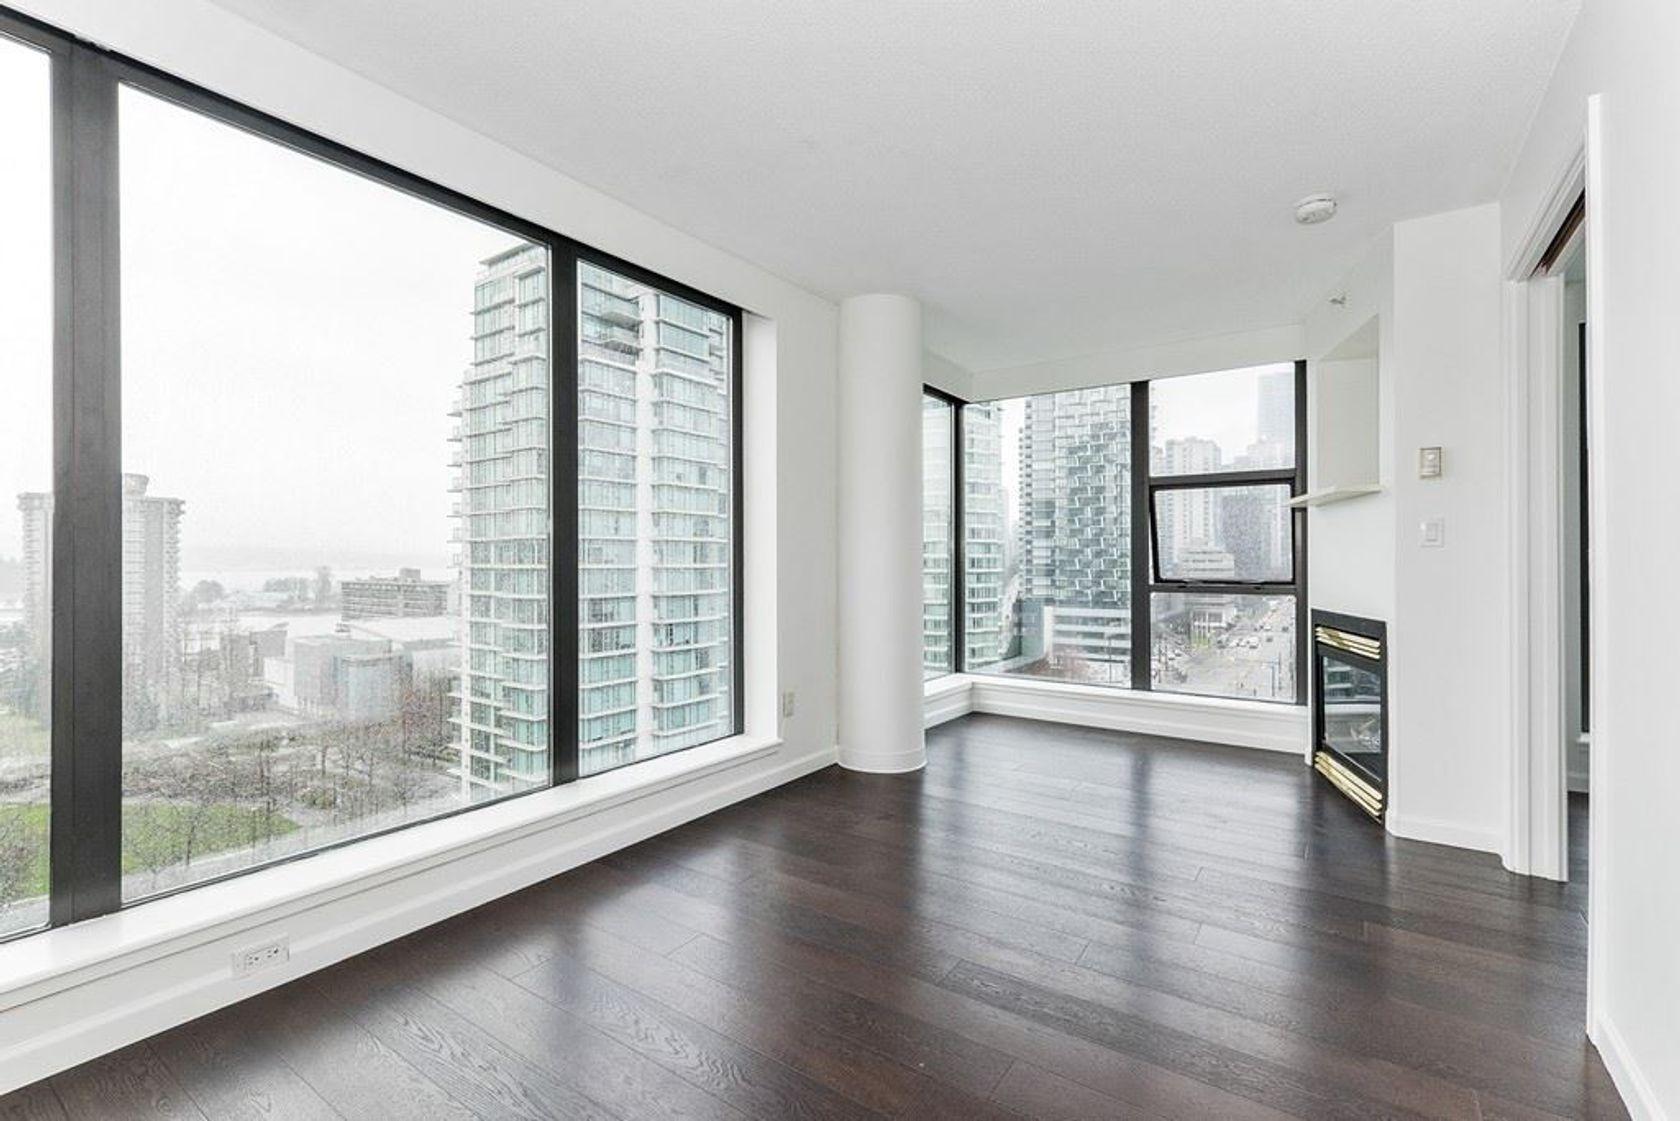 alberni-10 at 12th floor - 1723 Alberni, Coal Harbour, Vancouver West